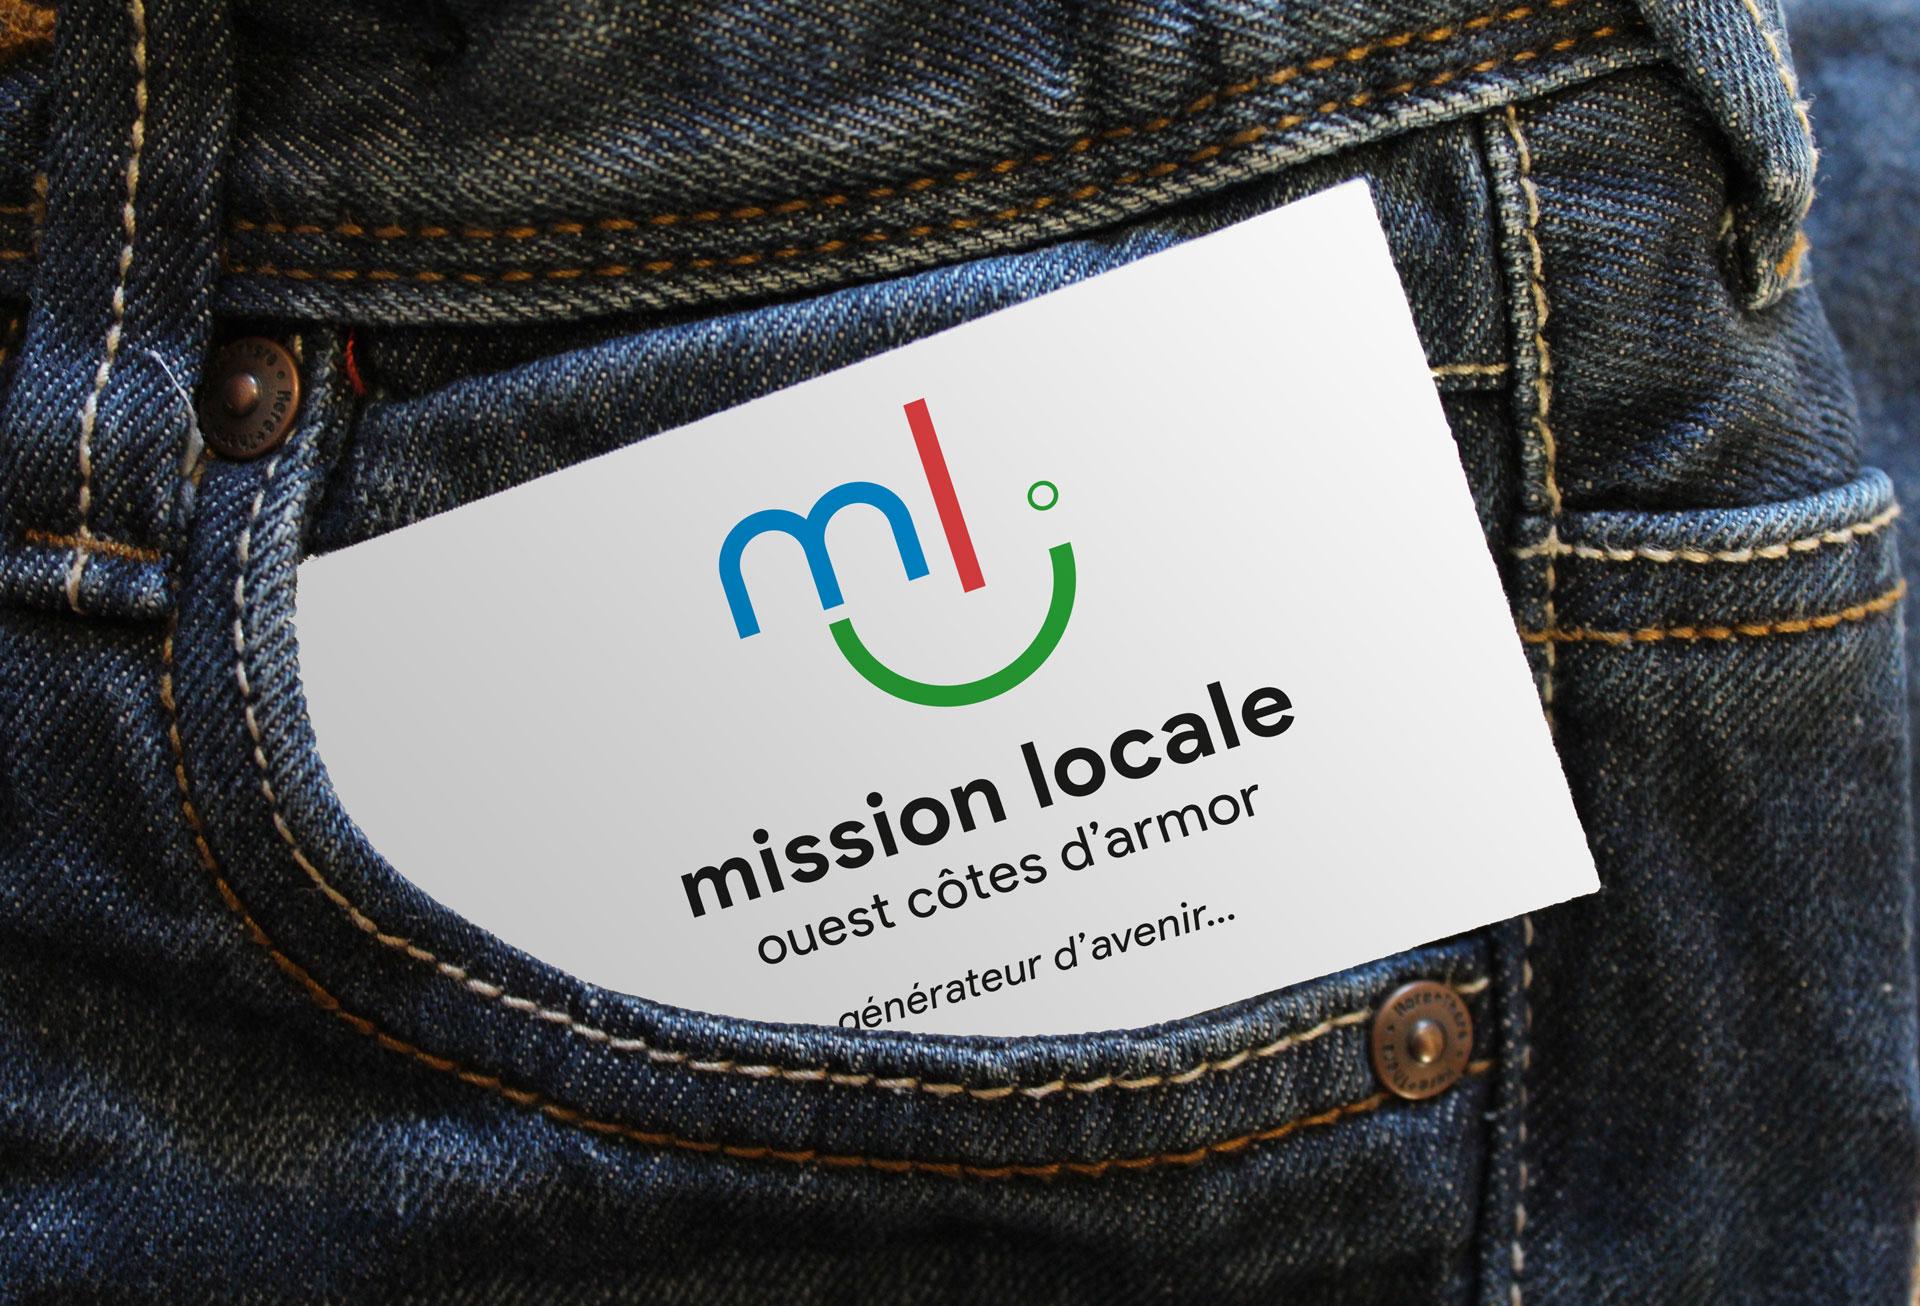 logo-mission-locale-ouest-cotes-darmor-coqueliko